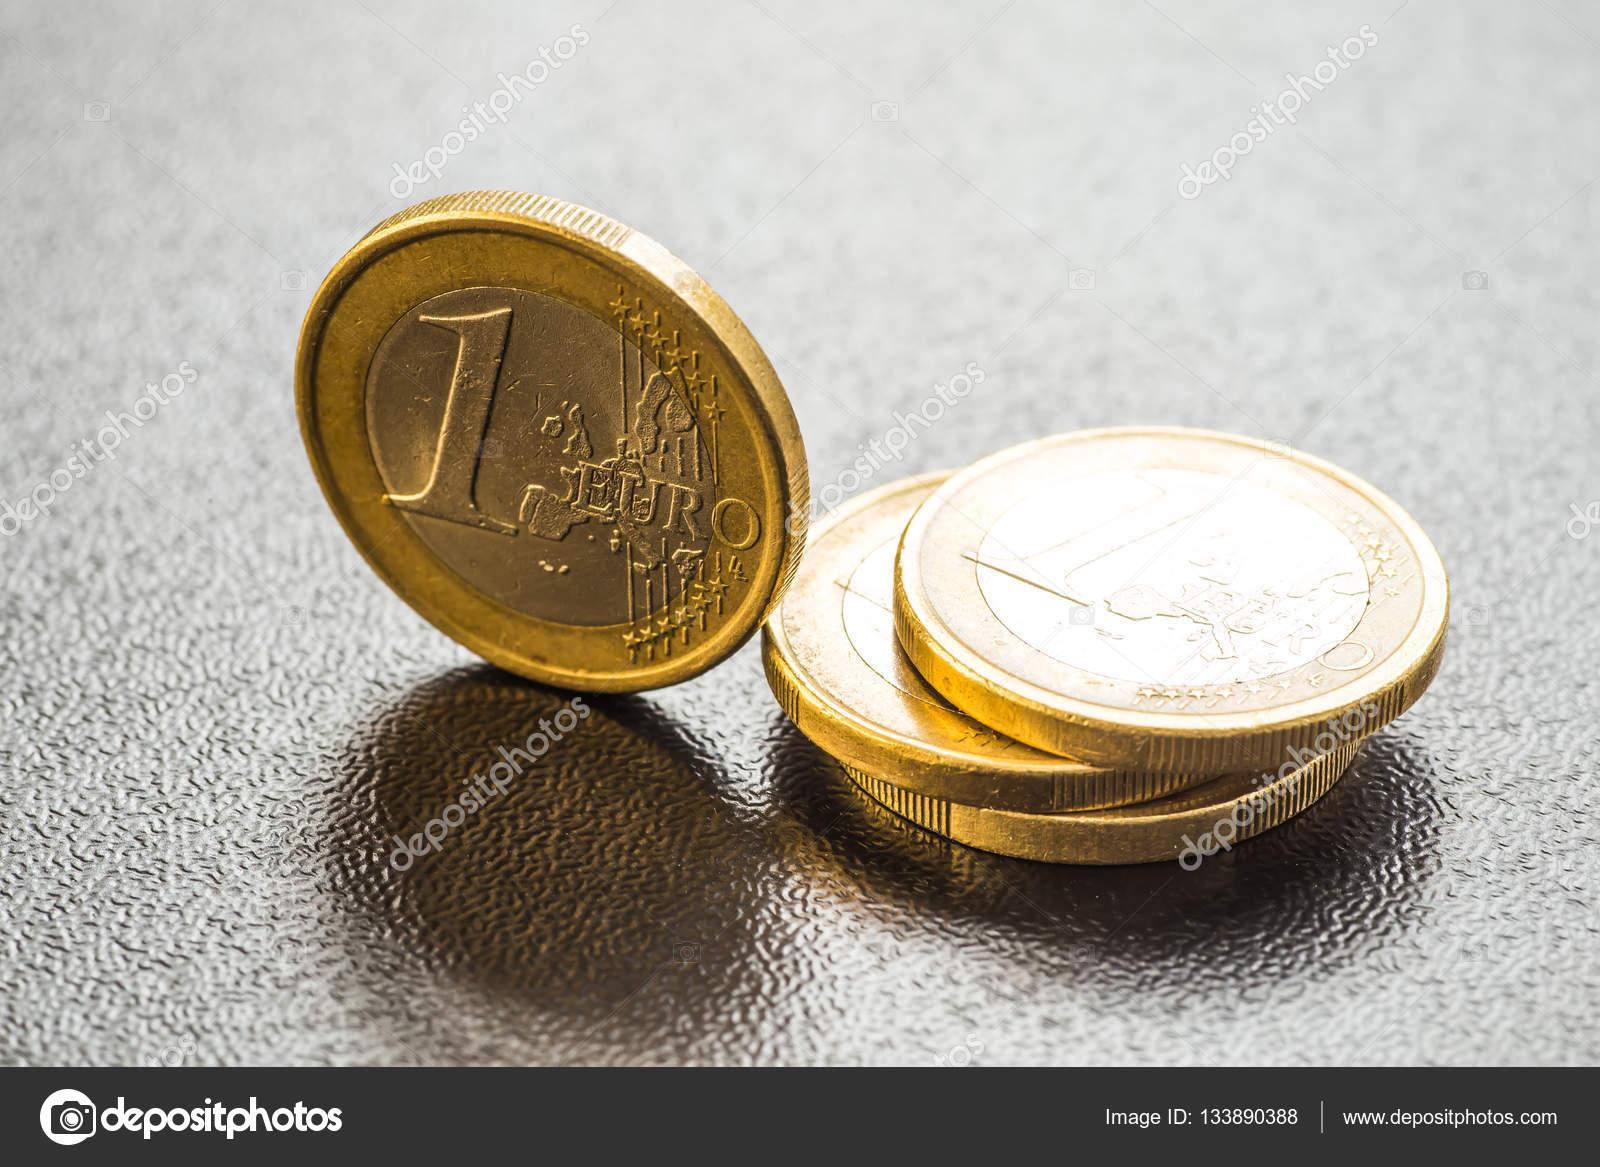 Siti scommesse deposito minimo 1 euro